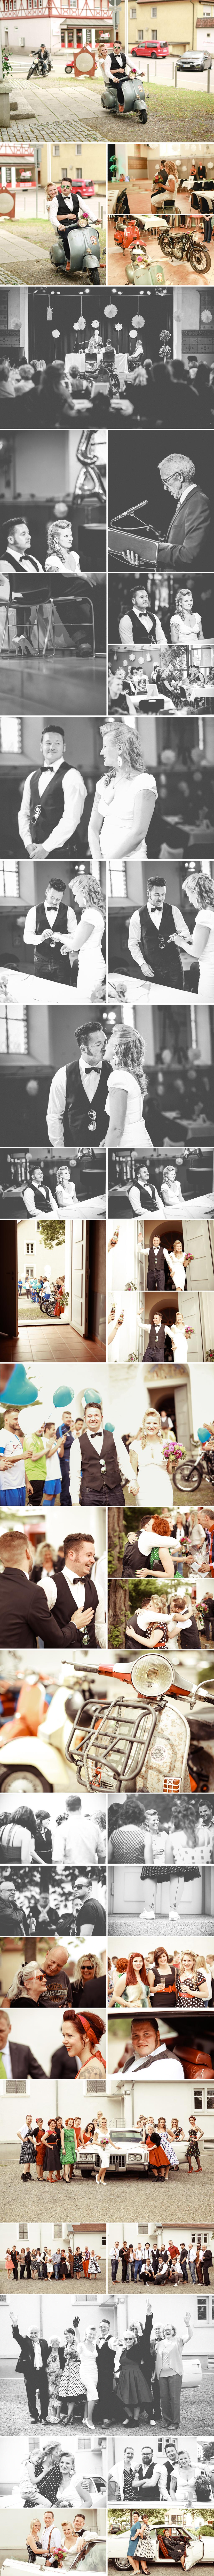 Hochzeit_Blog_Rockabilly_Reportage_1_web